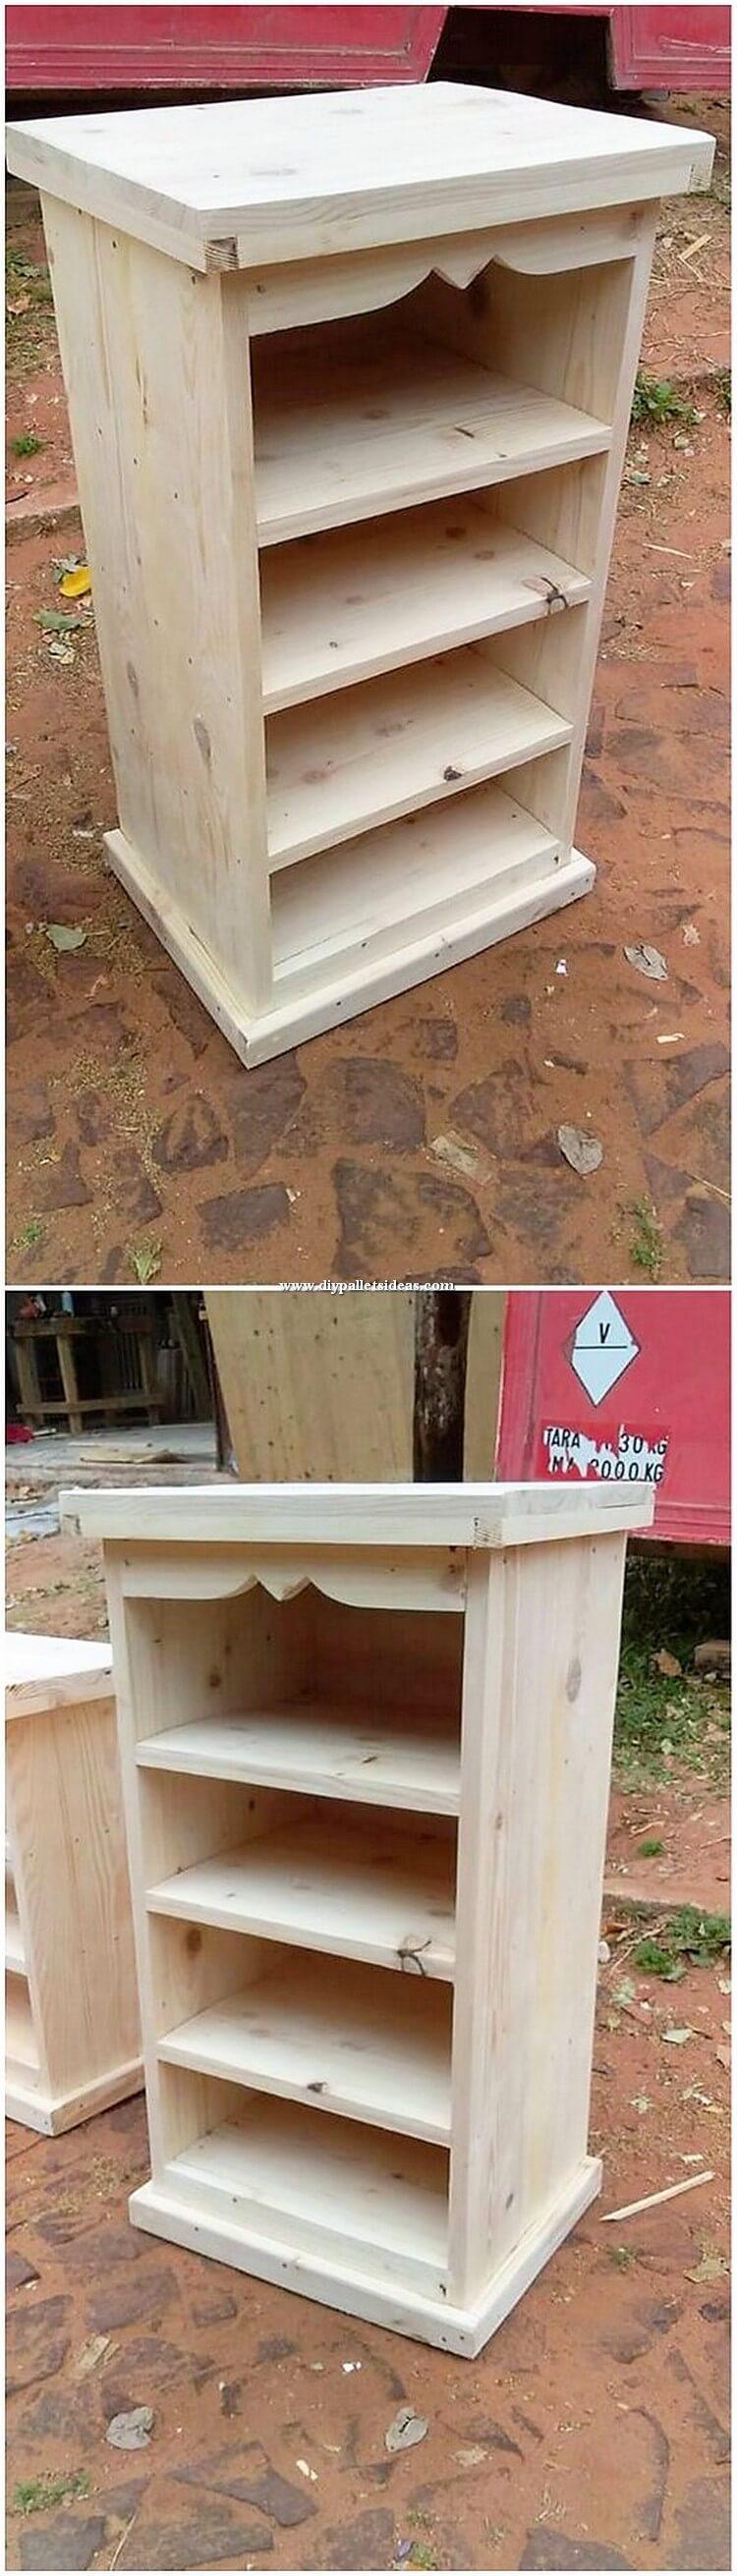 Pallet Shelving Cabinet